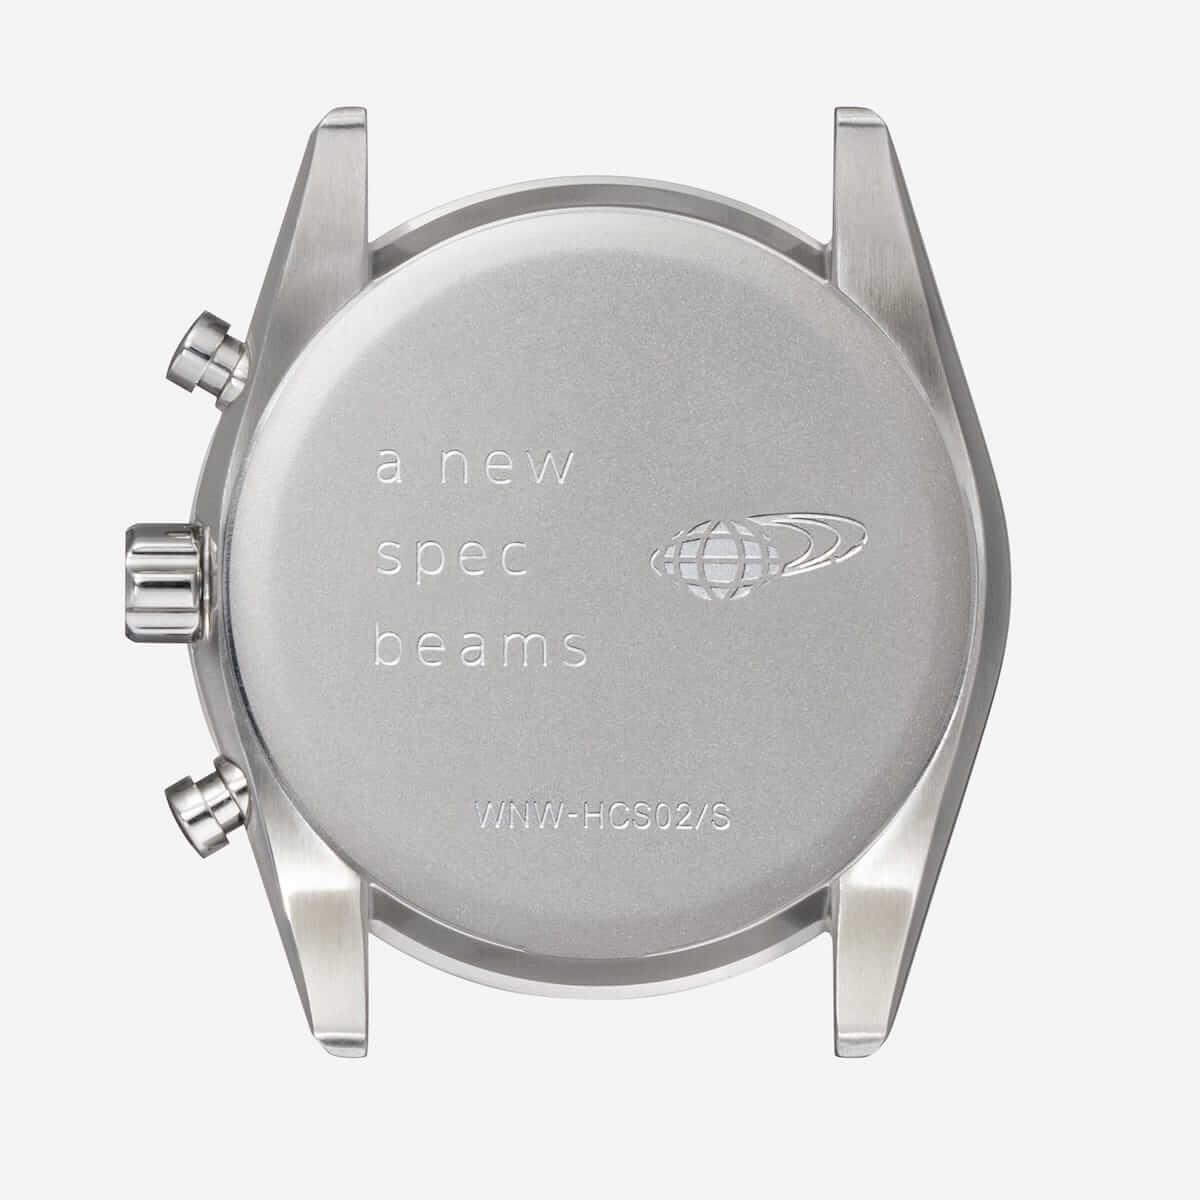 wena × beams コラボ第三弾、初のソーラー式の時計ヘッド部を採用! technology180626_wena_beams_05-1200x1200